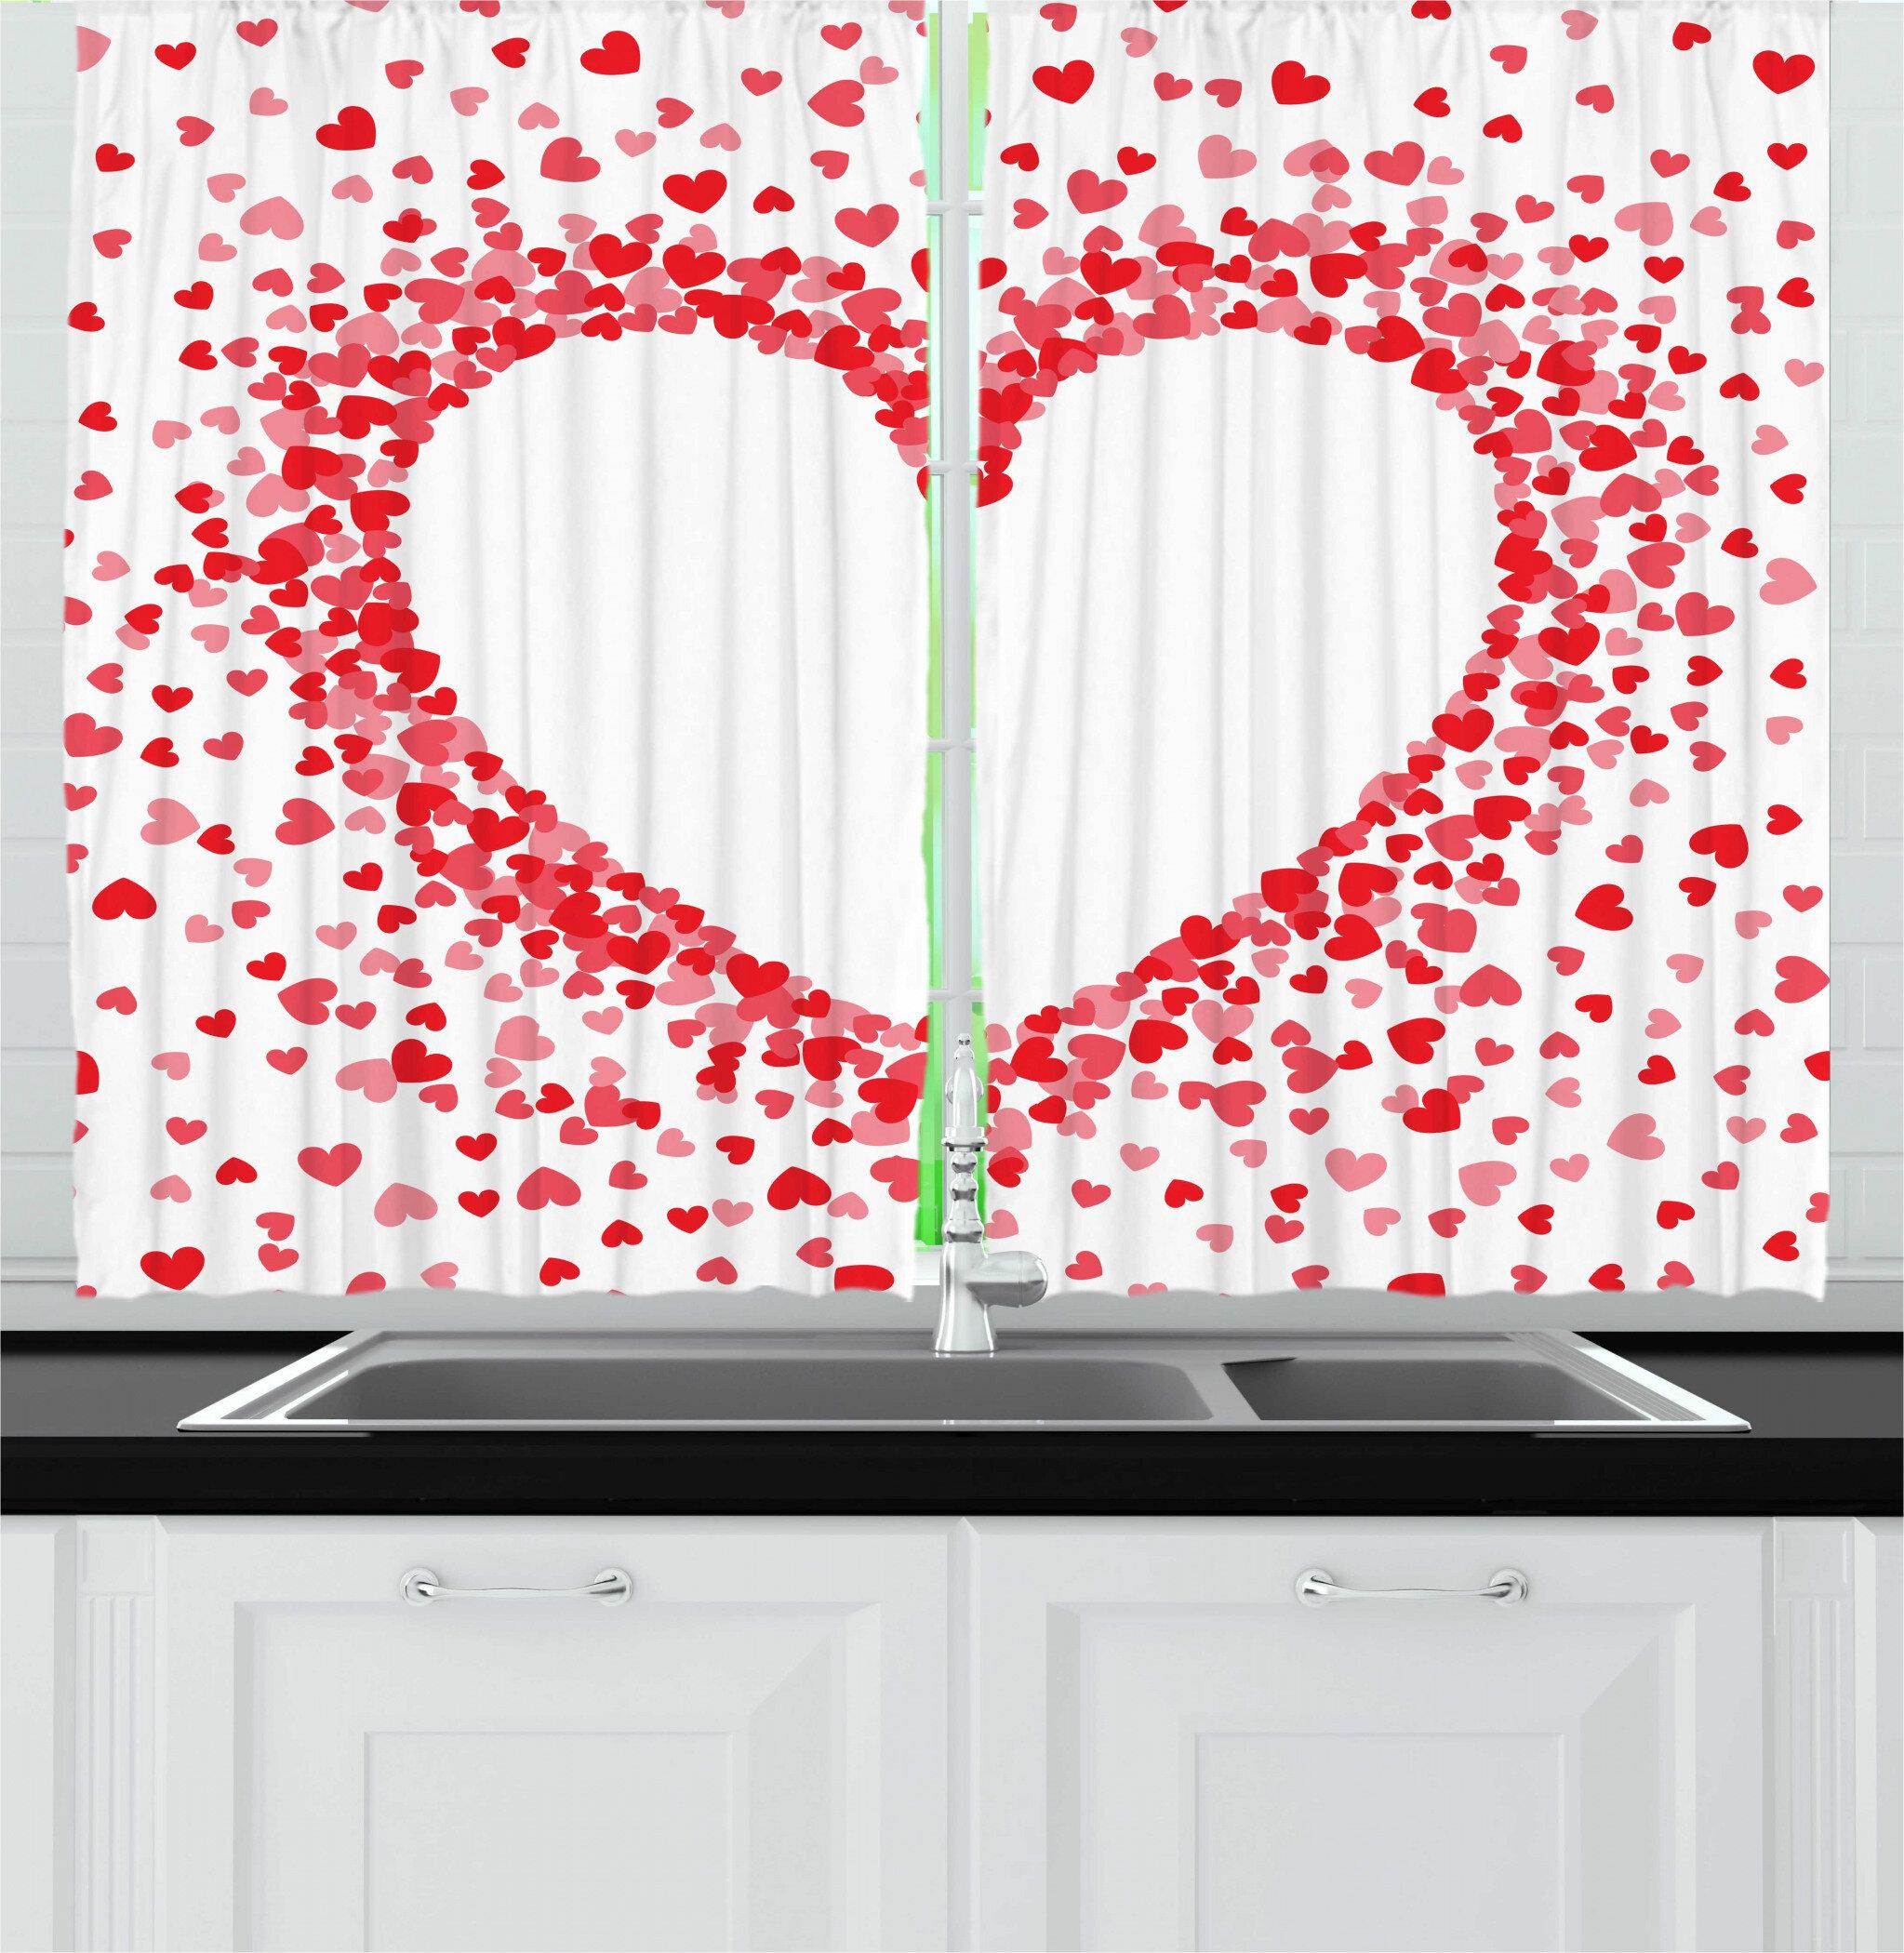 East Urban Home 2 Piece Vintage Valentine Spreading Tiny Bicolor Hearts Making A Big Romantic Shape Kitchen Curtain Set Wayfair